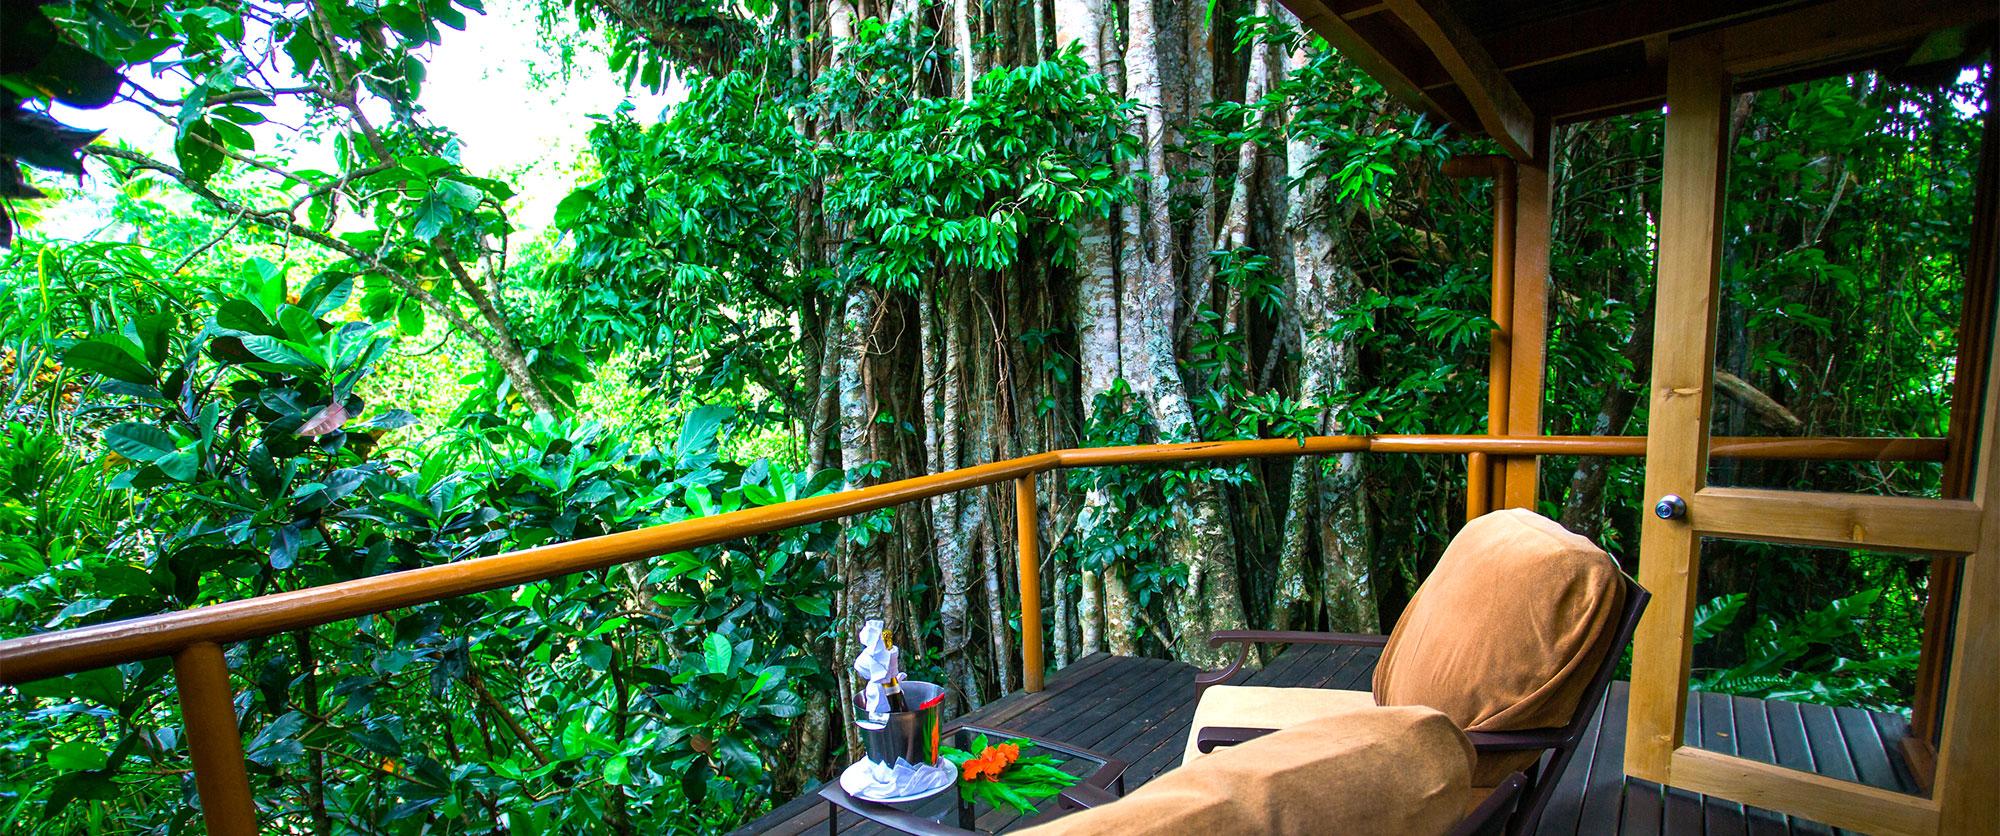 Fiji Honeymoon Package - Namale Resort and Spa